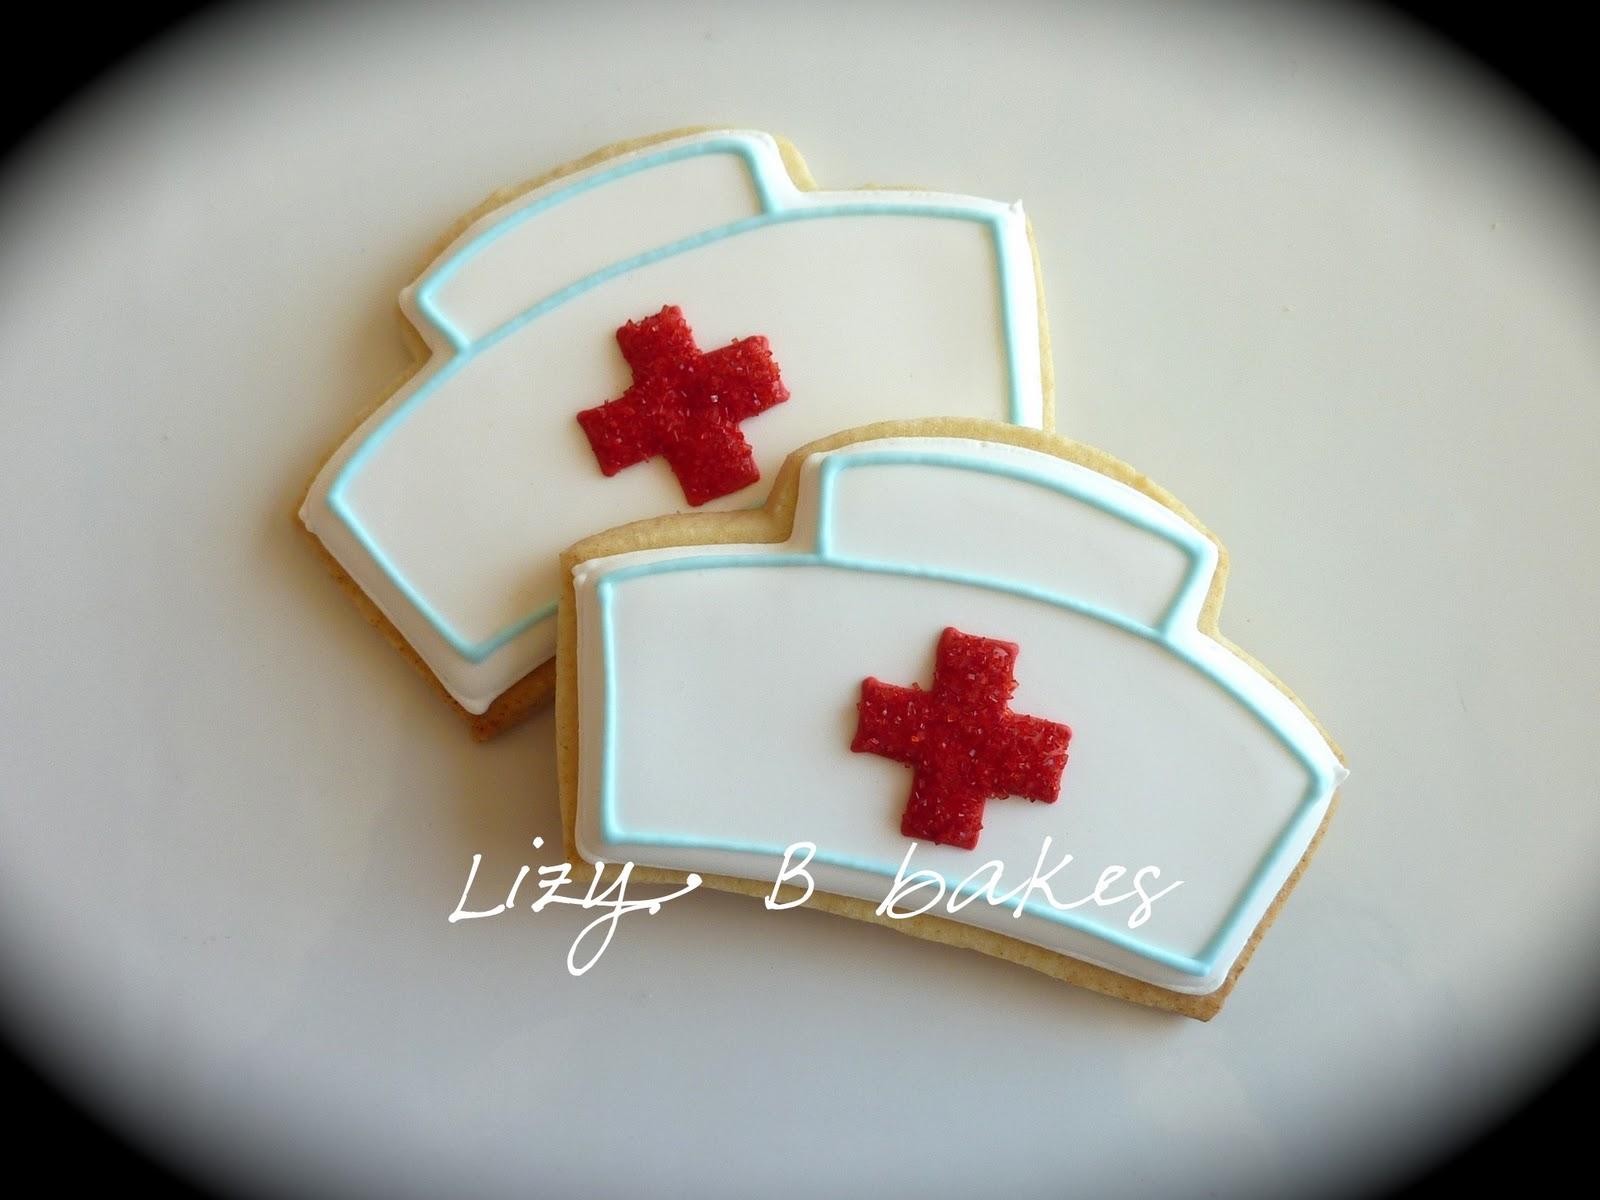 lizy b nurses heal